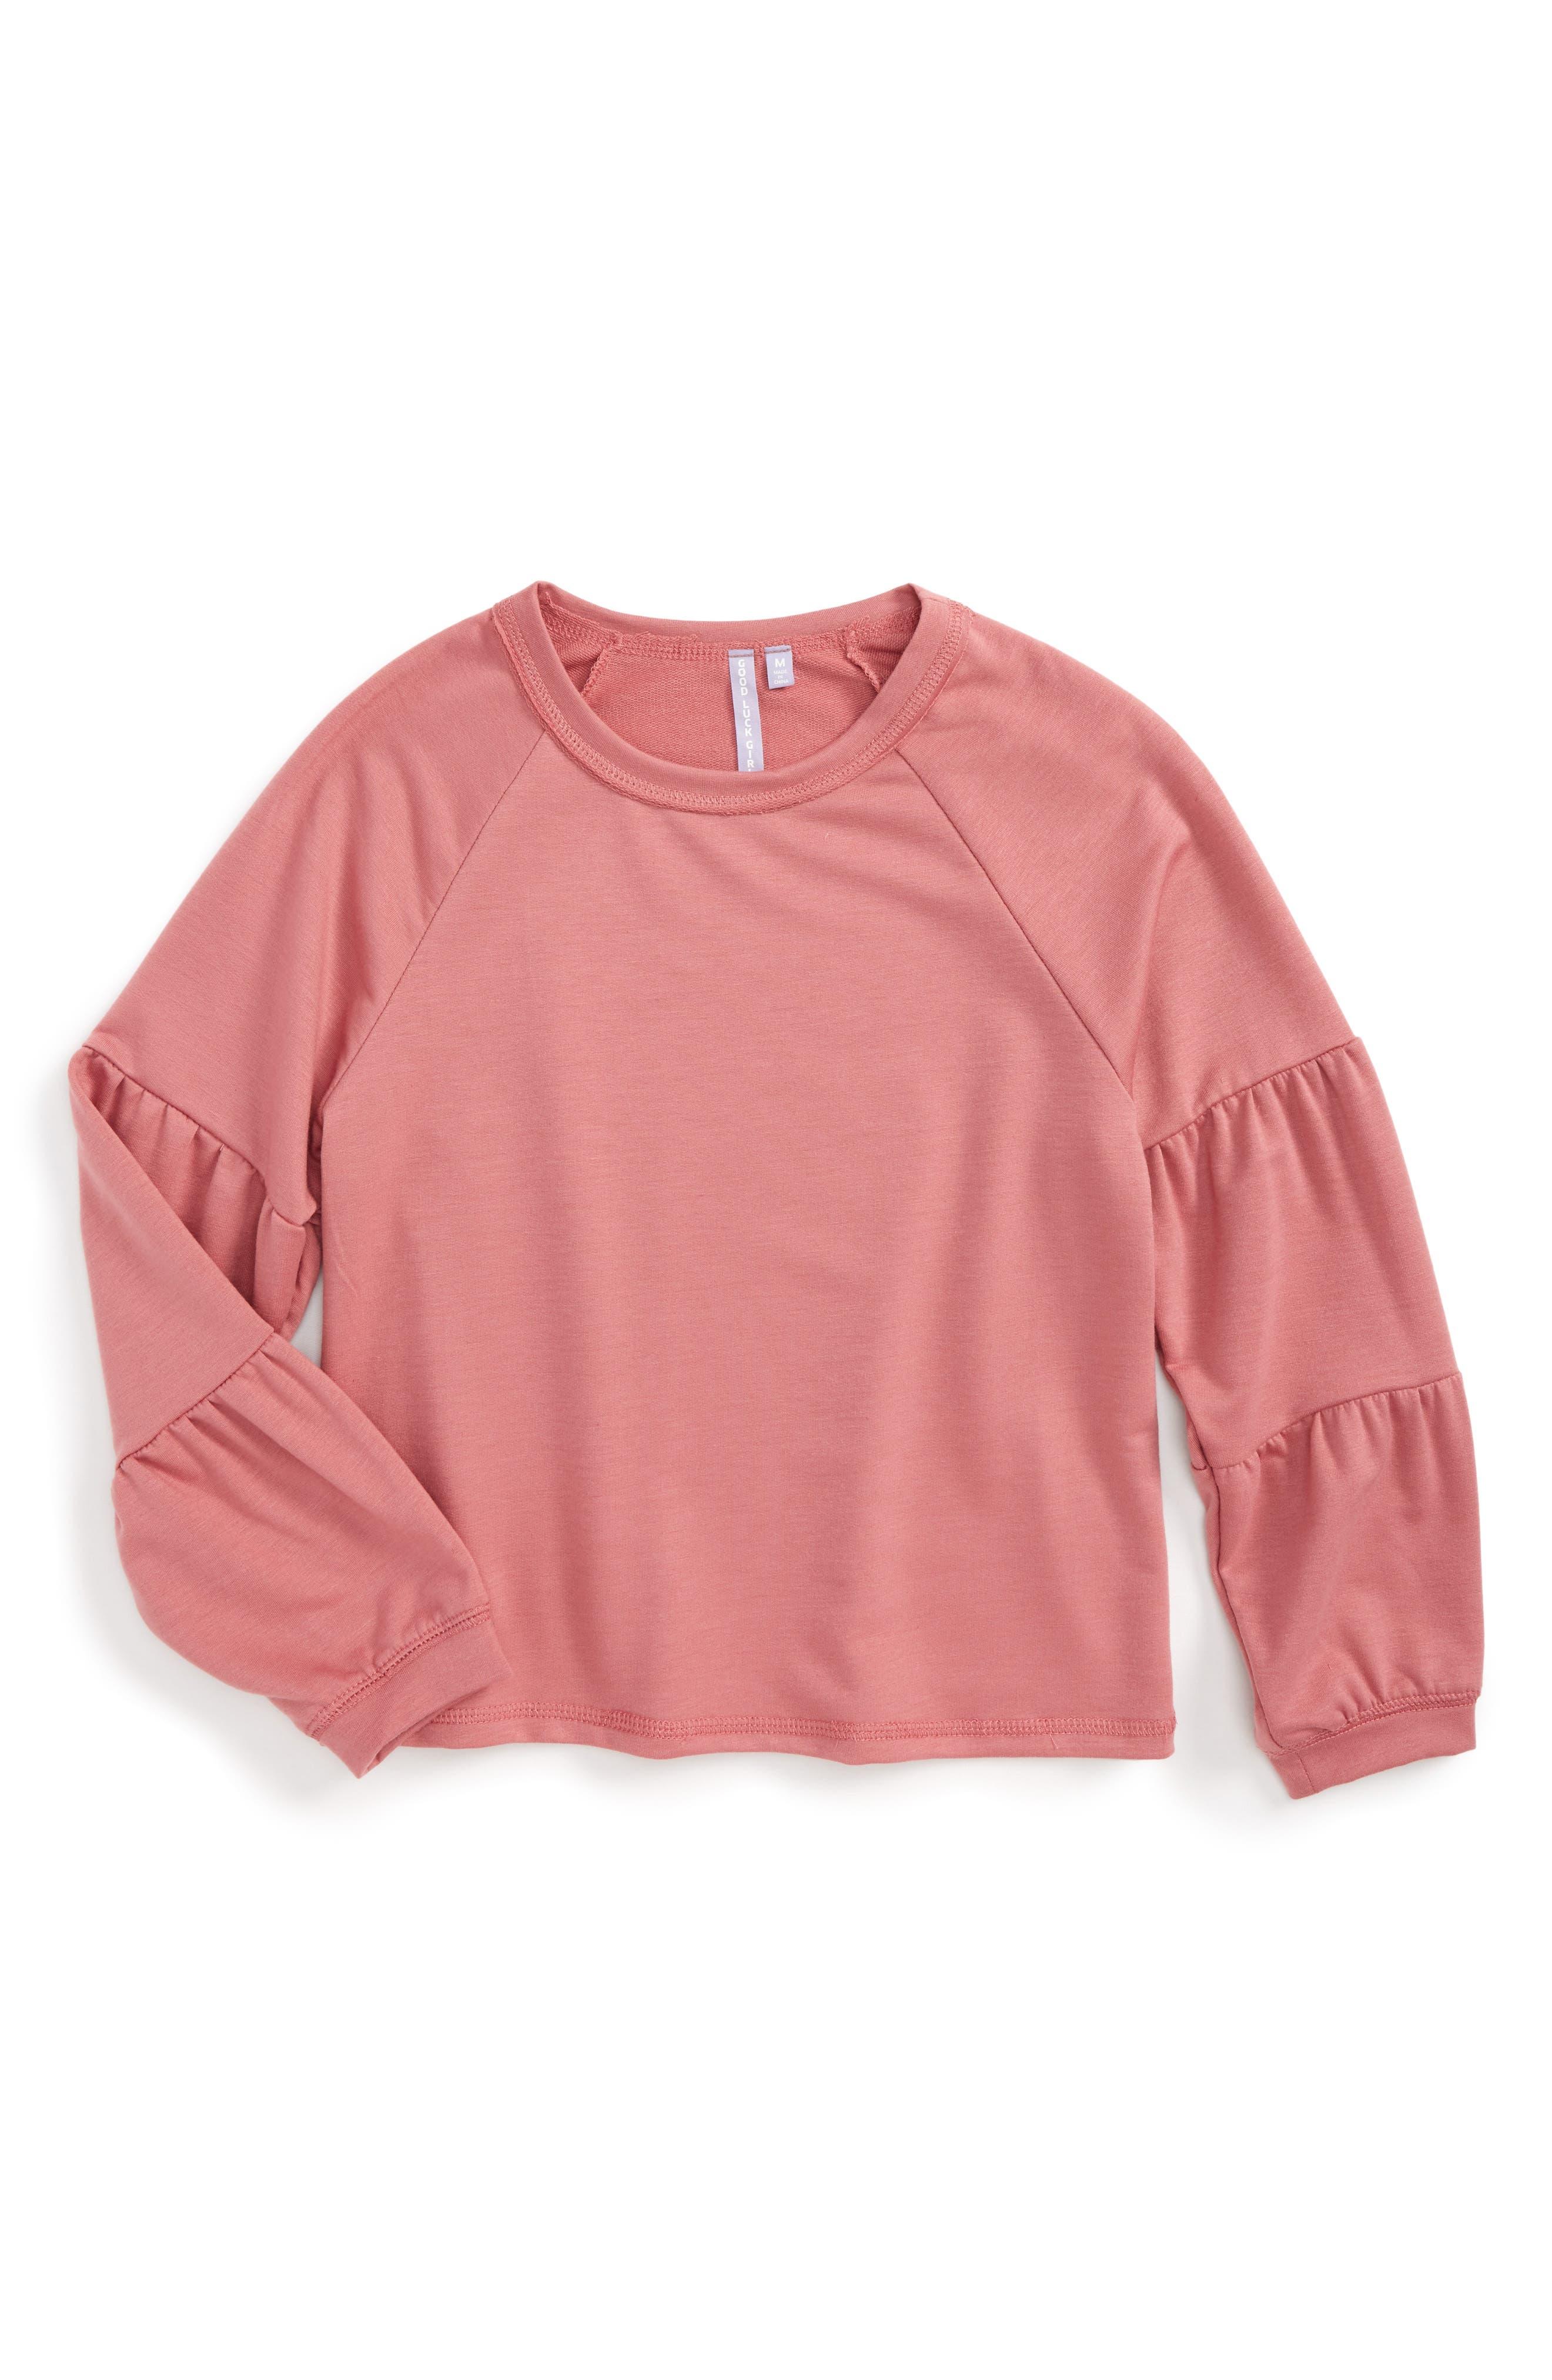 Good Luck Gem Tiered Sleeve Sweatshirt (Big Girls)